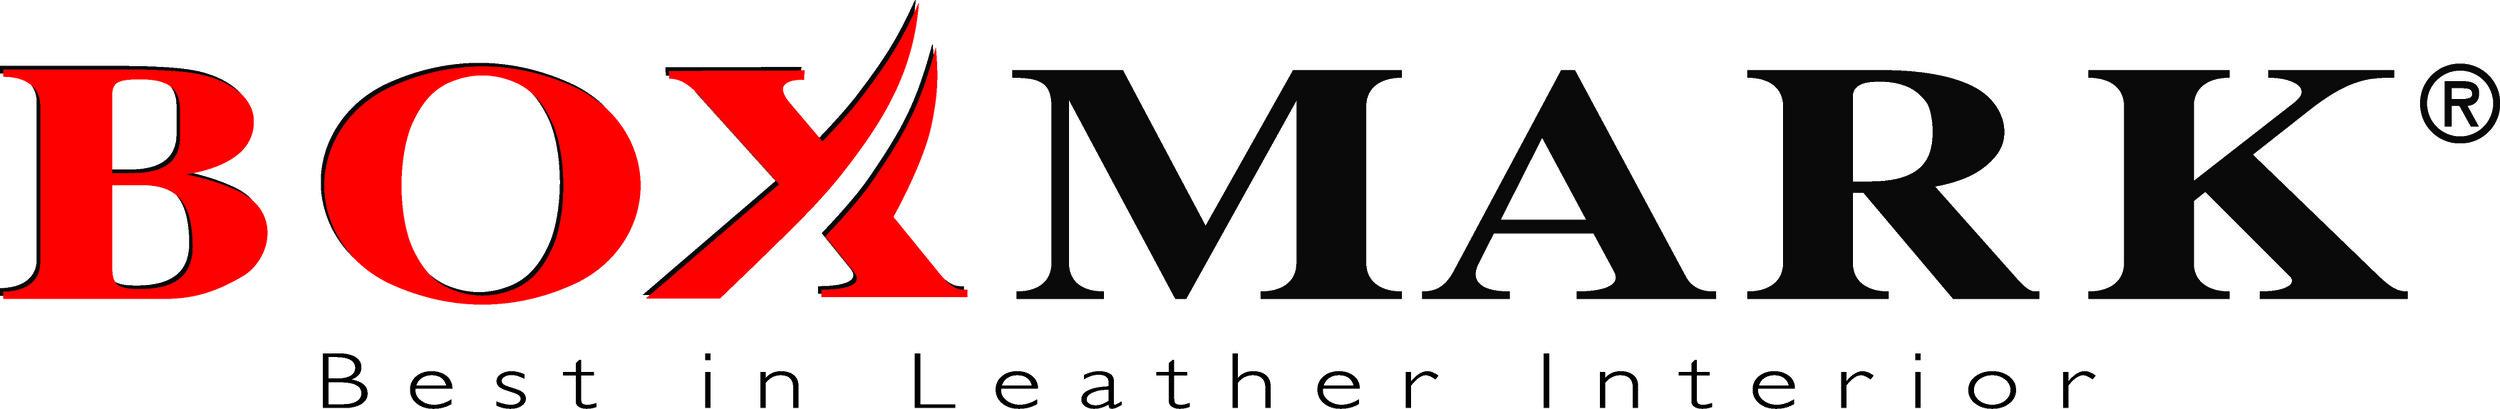 Logo Boxmark CMYK.JPG